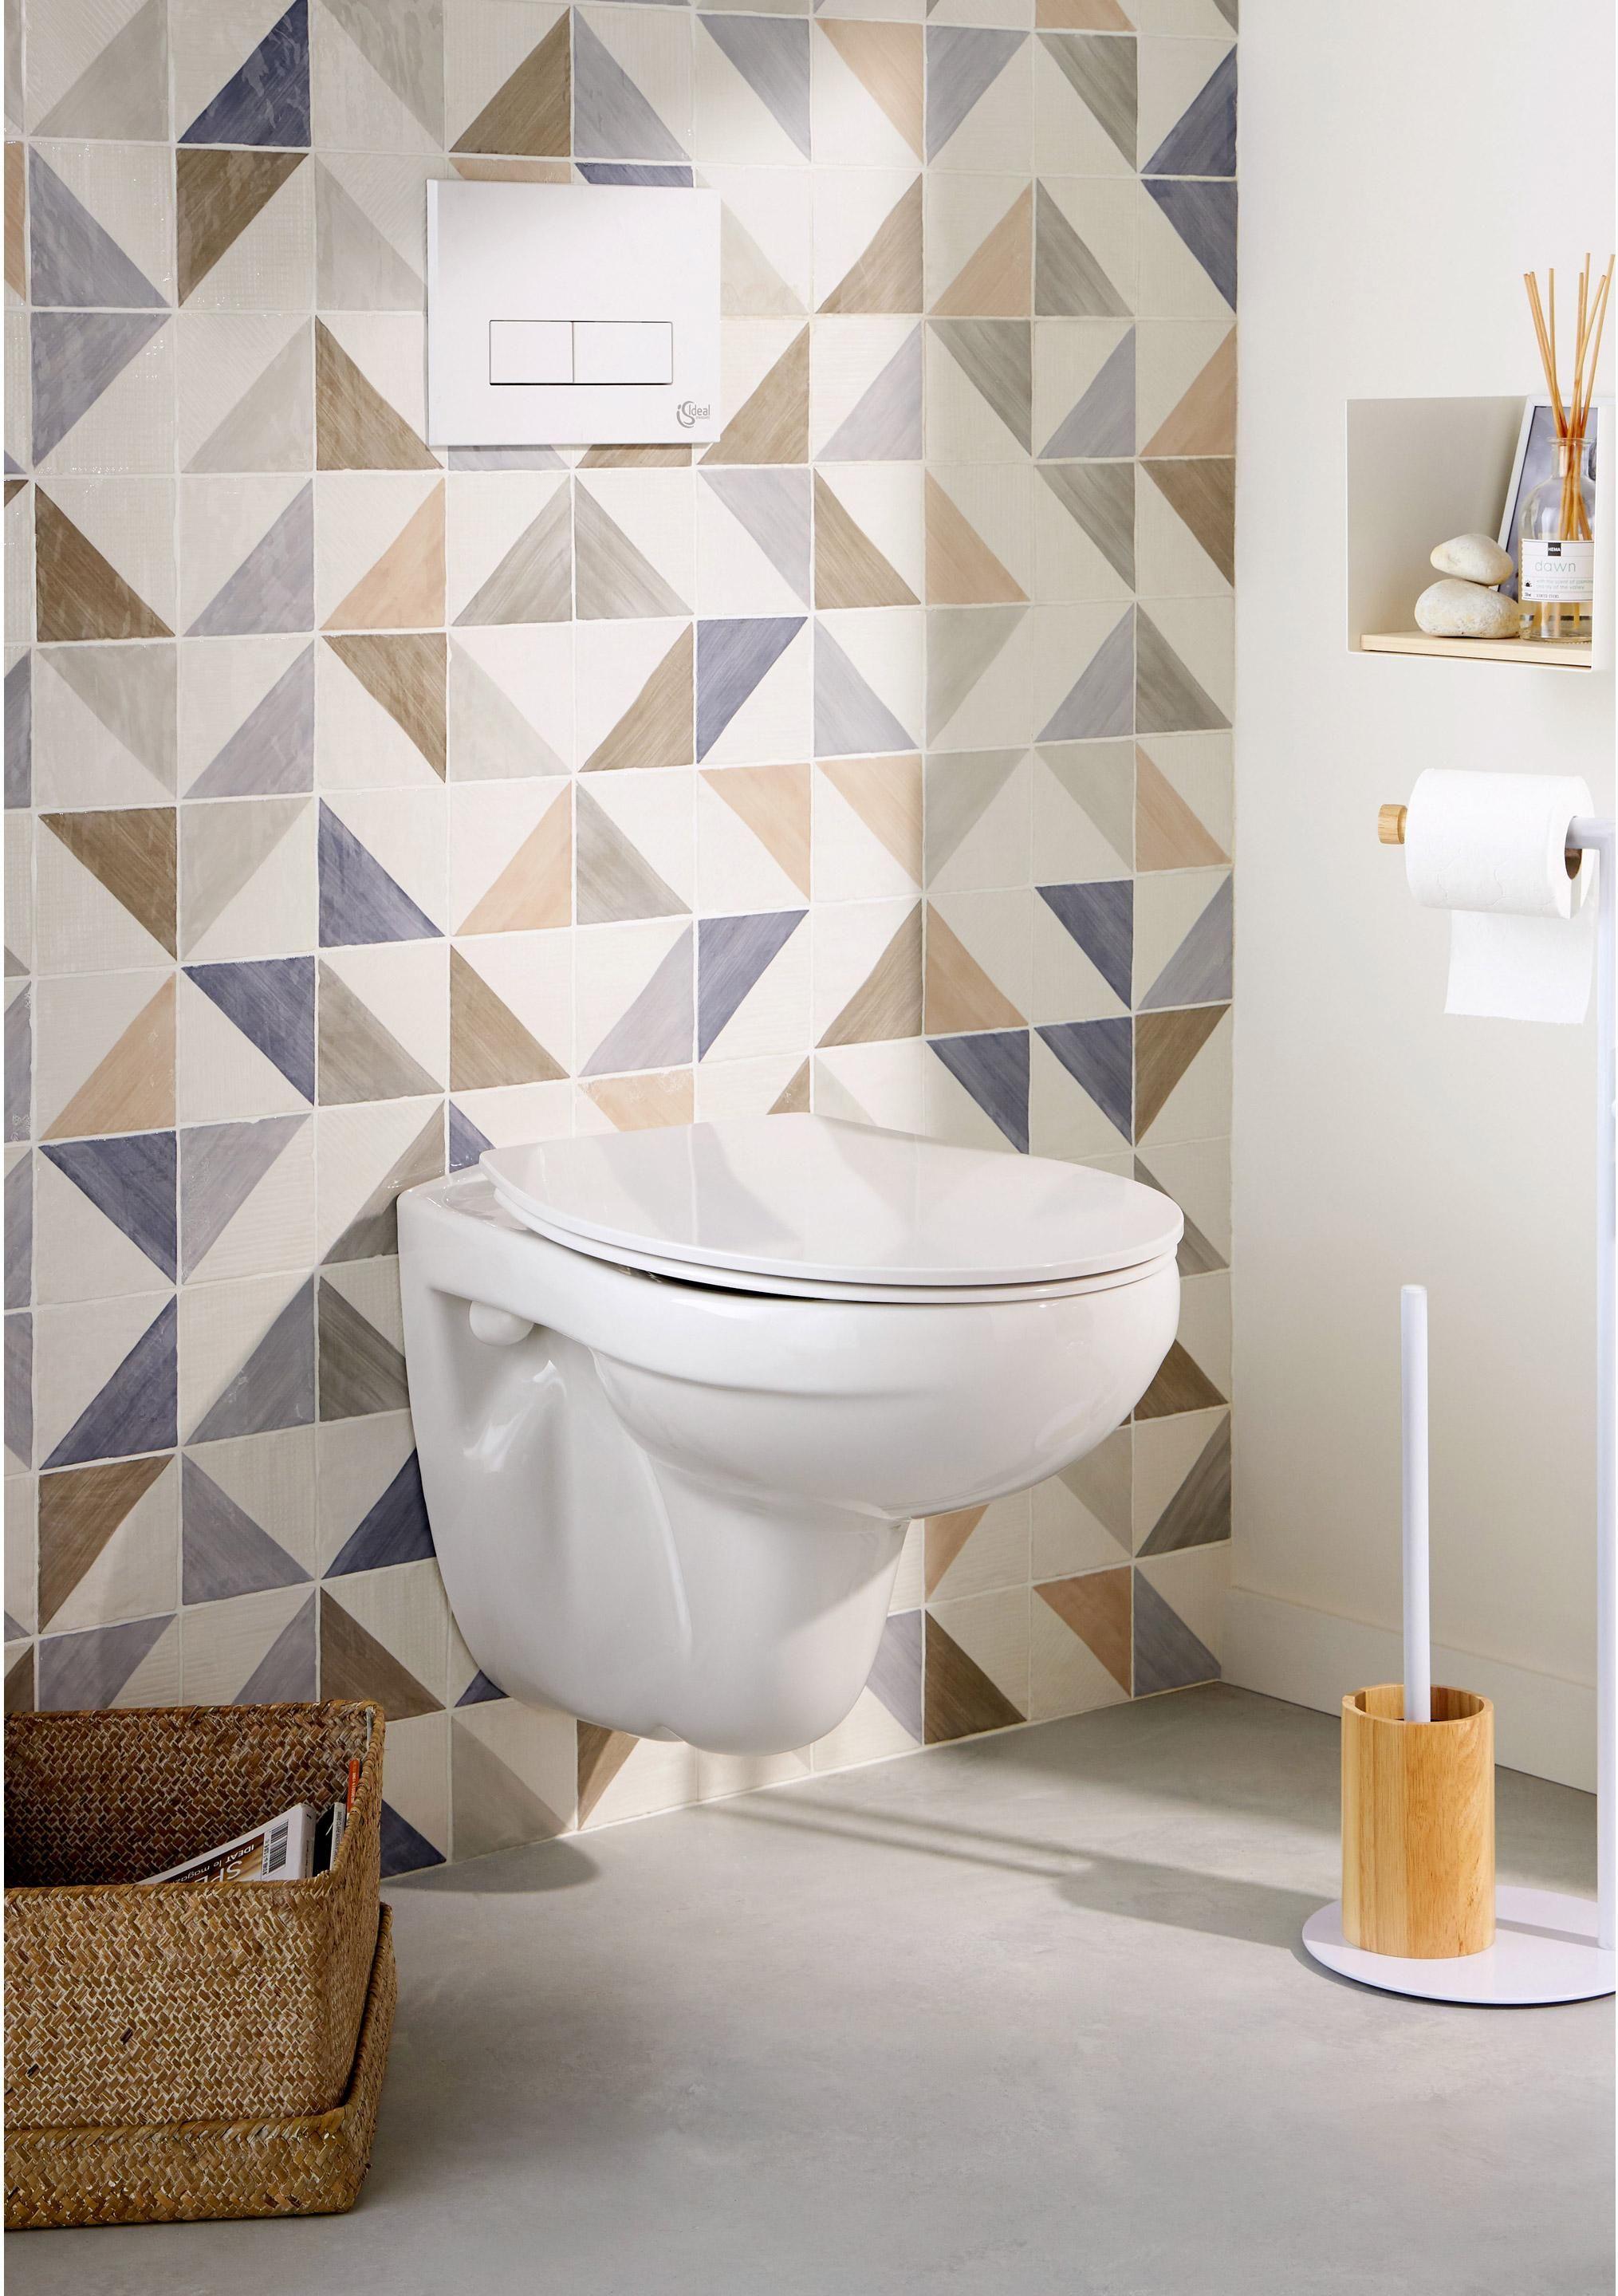 Pack Wc Suspendu Bati Universel Double Asolo Ideal Standard En 2020 Wc Suspendu Deco Toilettes Habillage Wc Suspendu